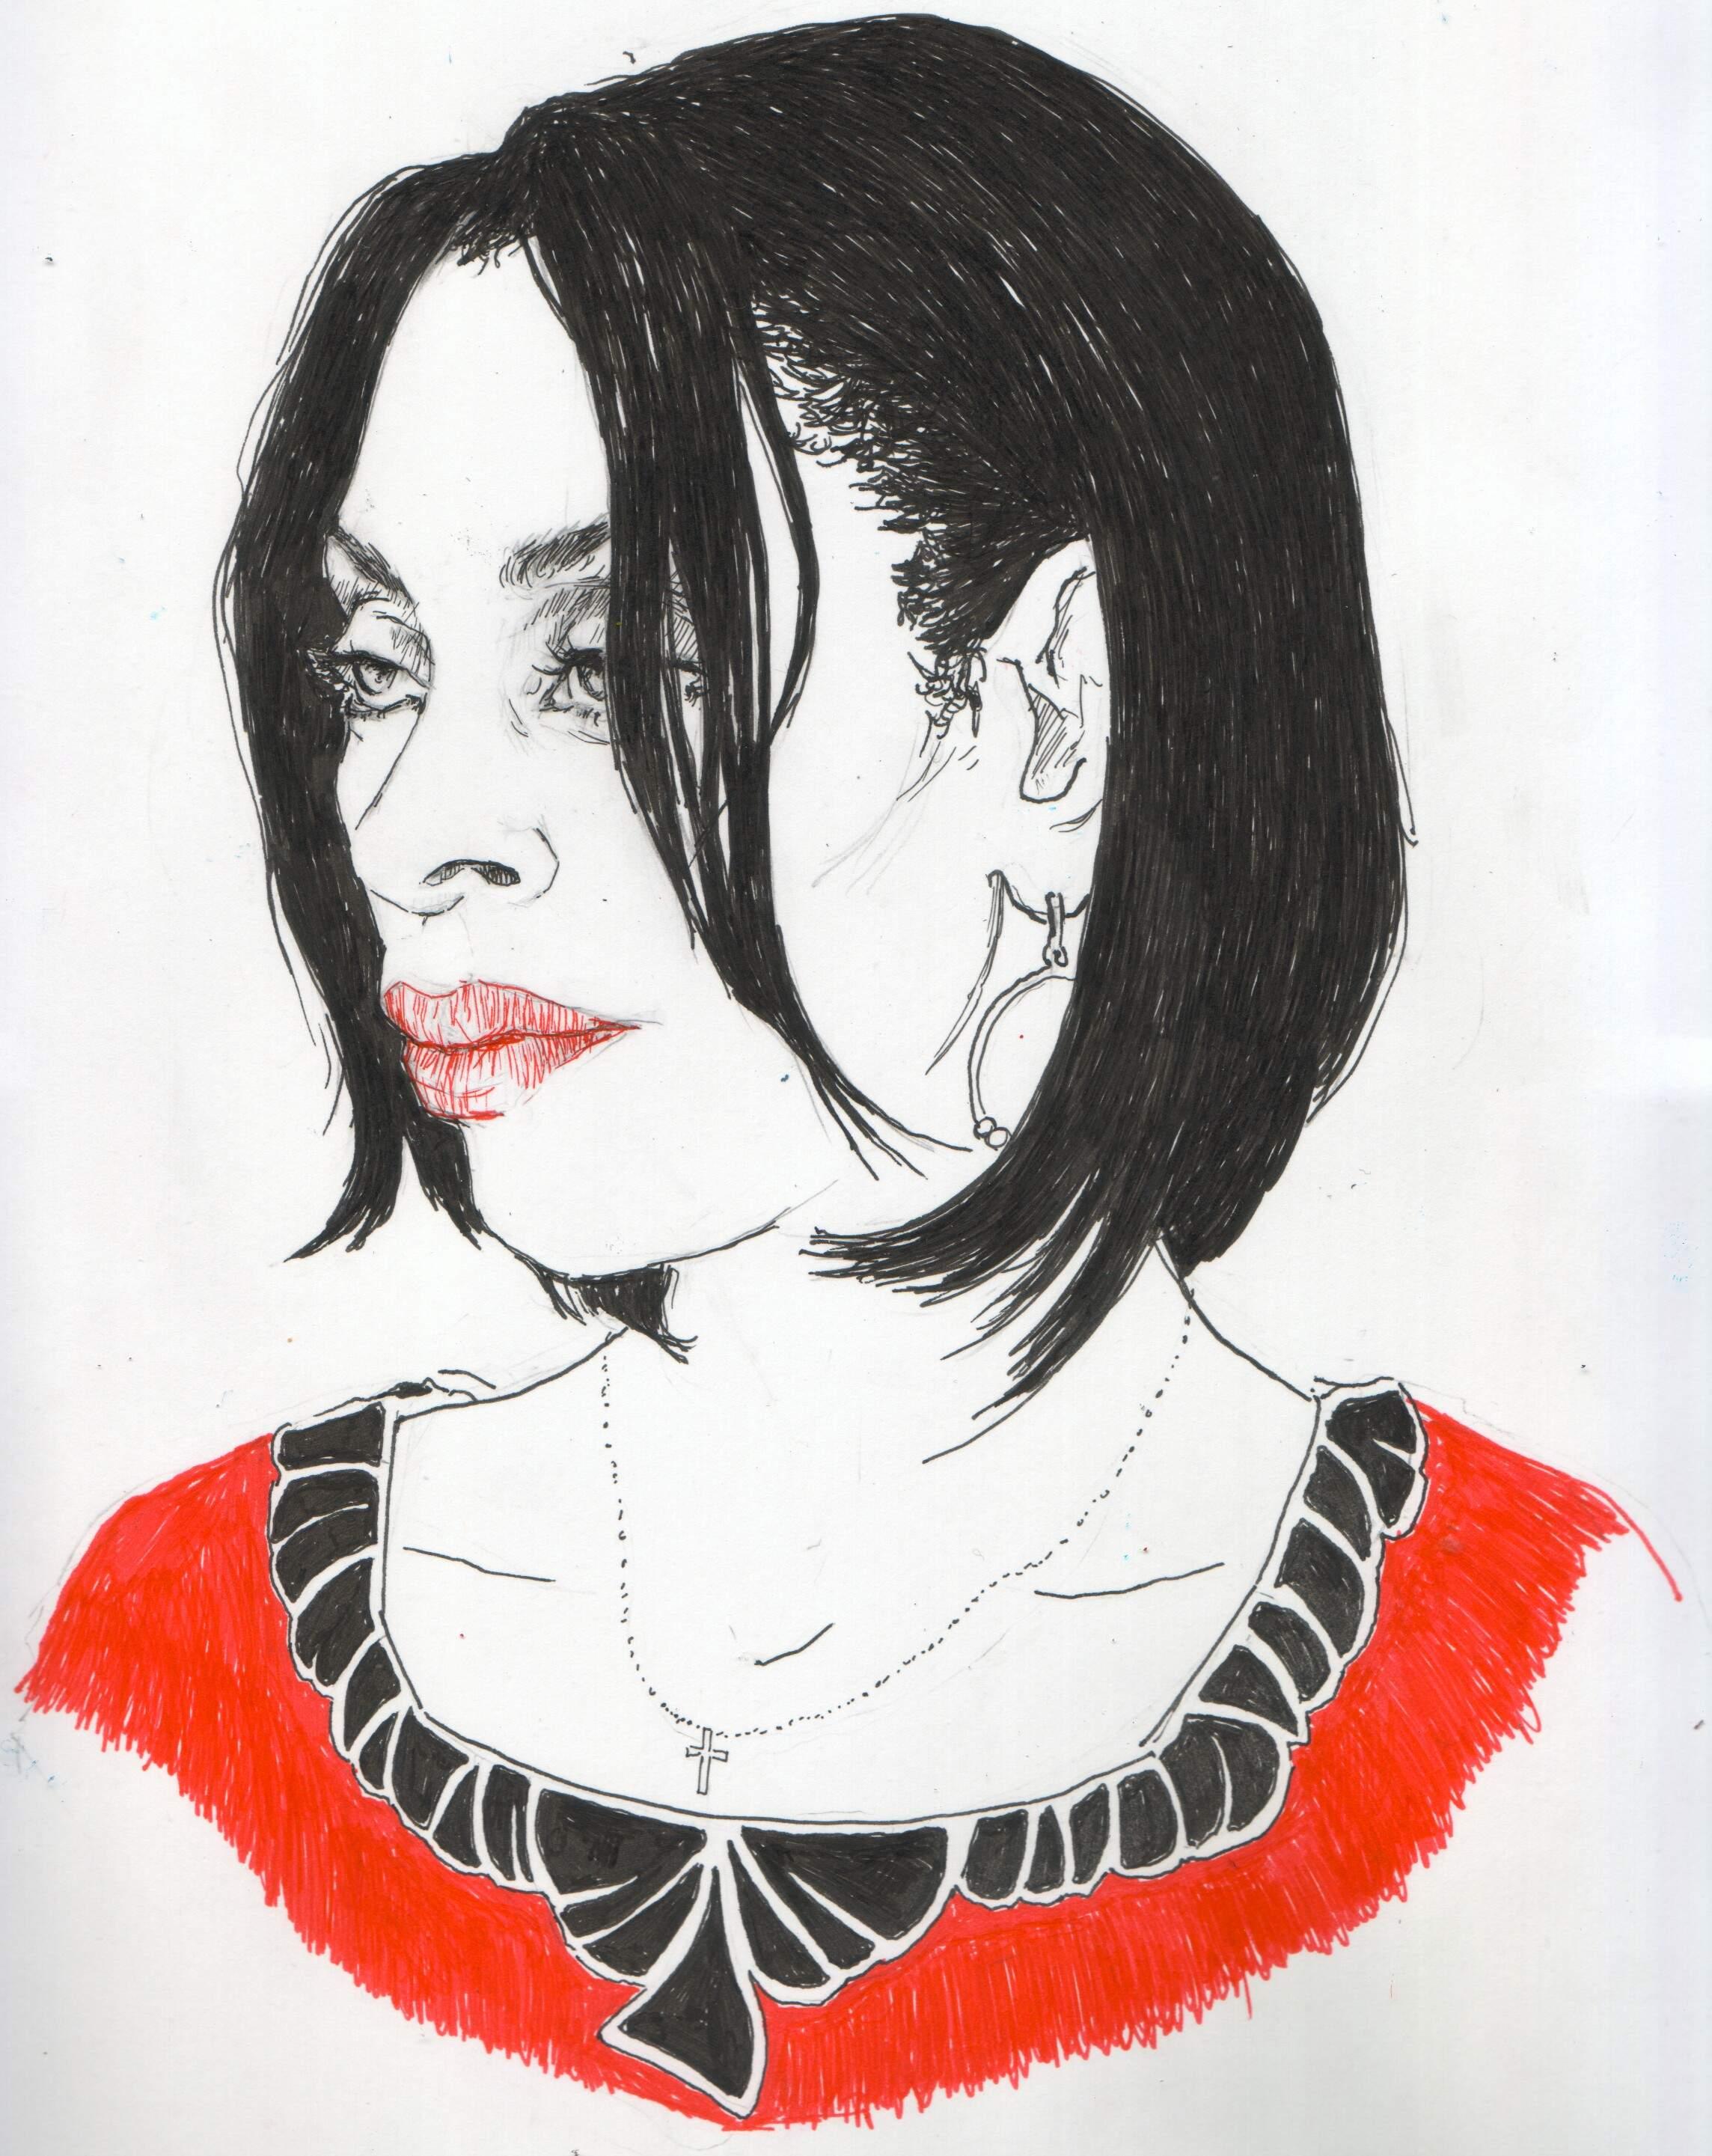 Khandi Alexander